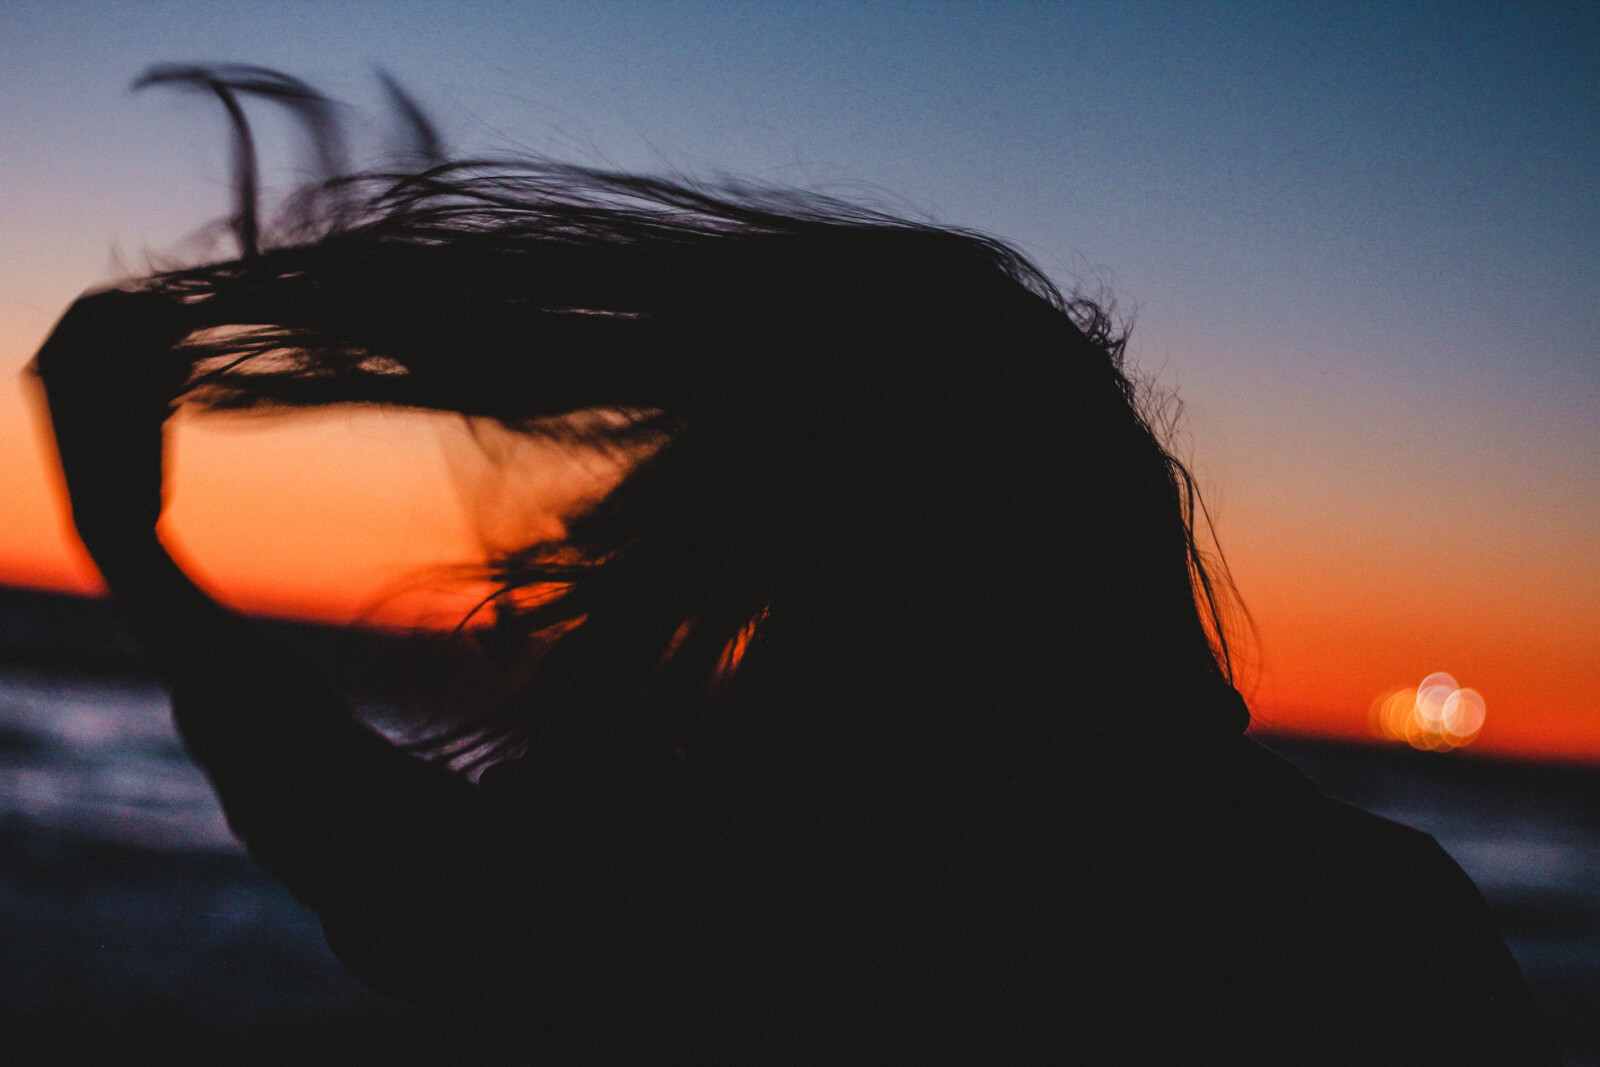 Davines-Naturaltech-Energizing-Gel-abloomnova.net_-1600x1067 What causes hair loss?